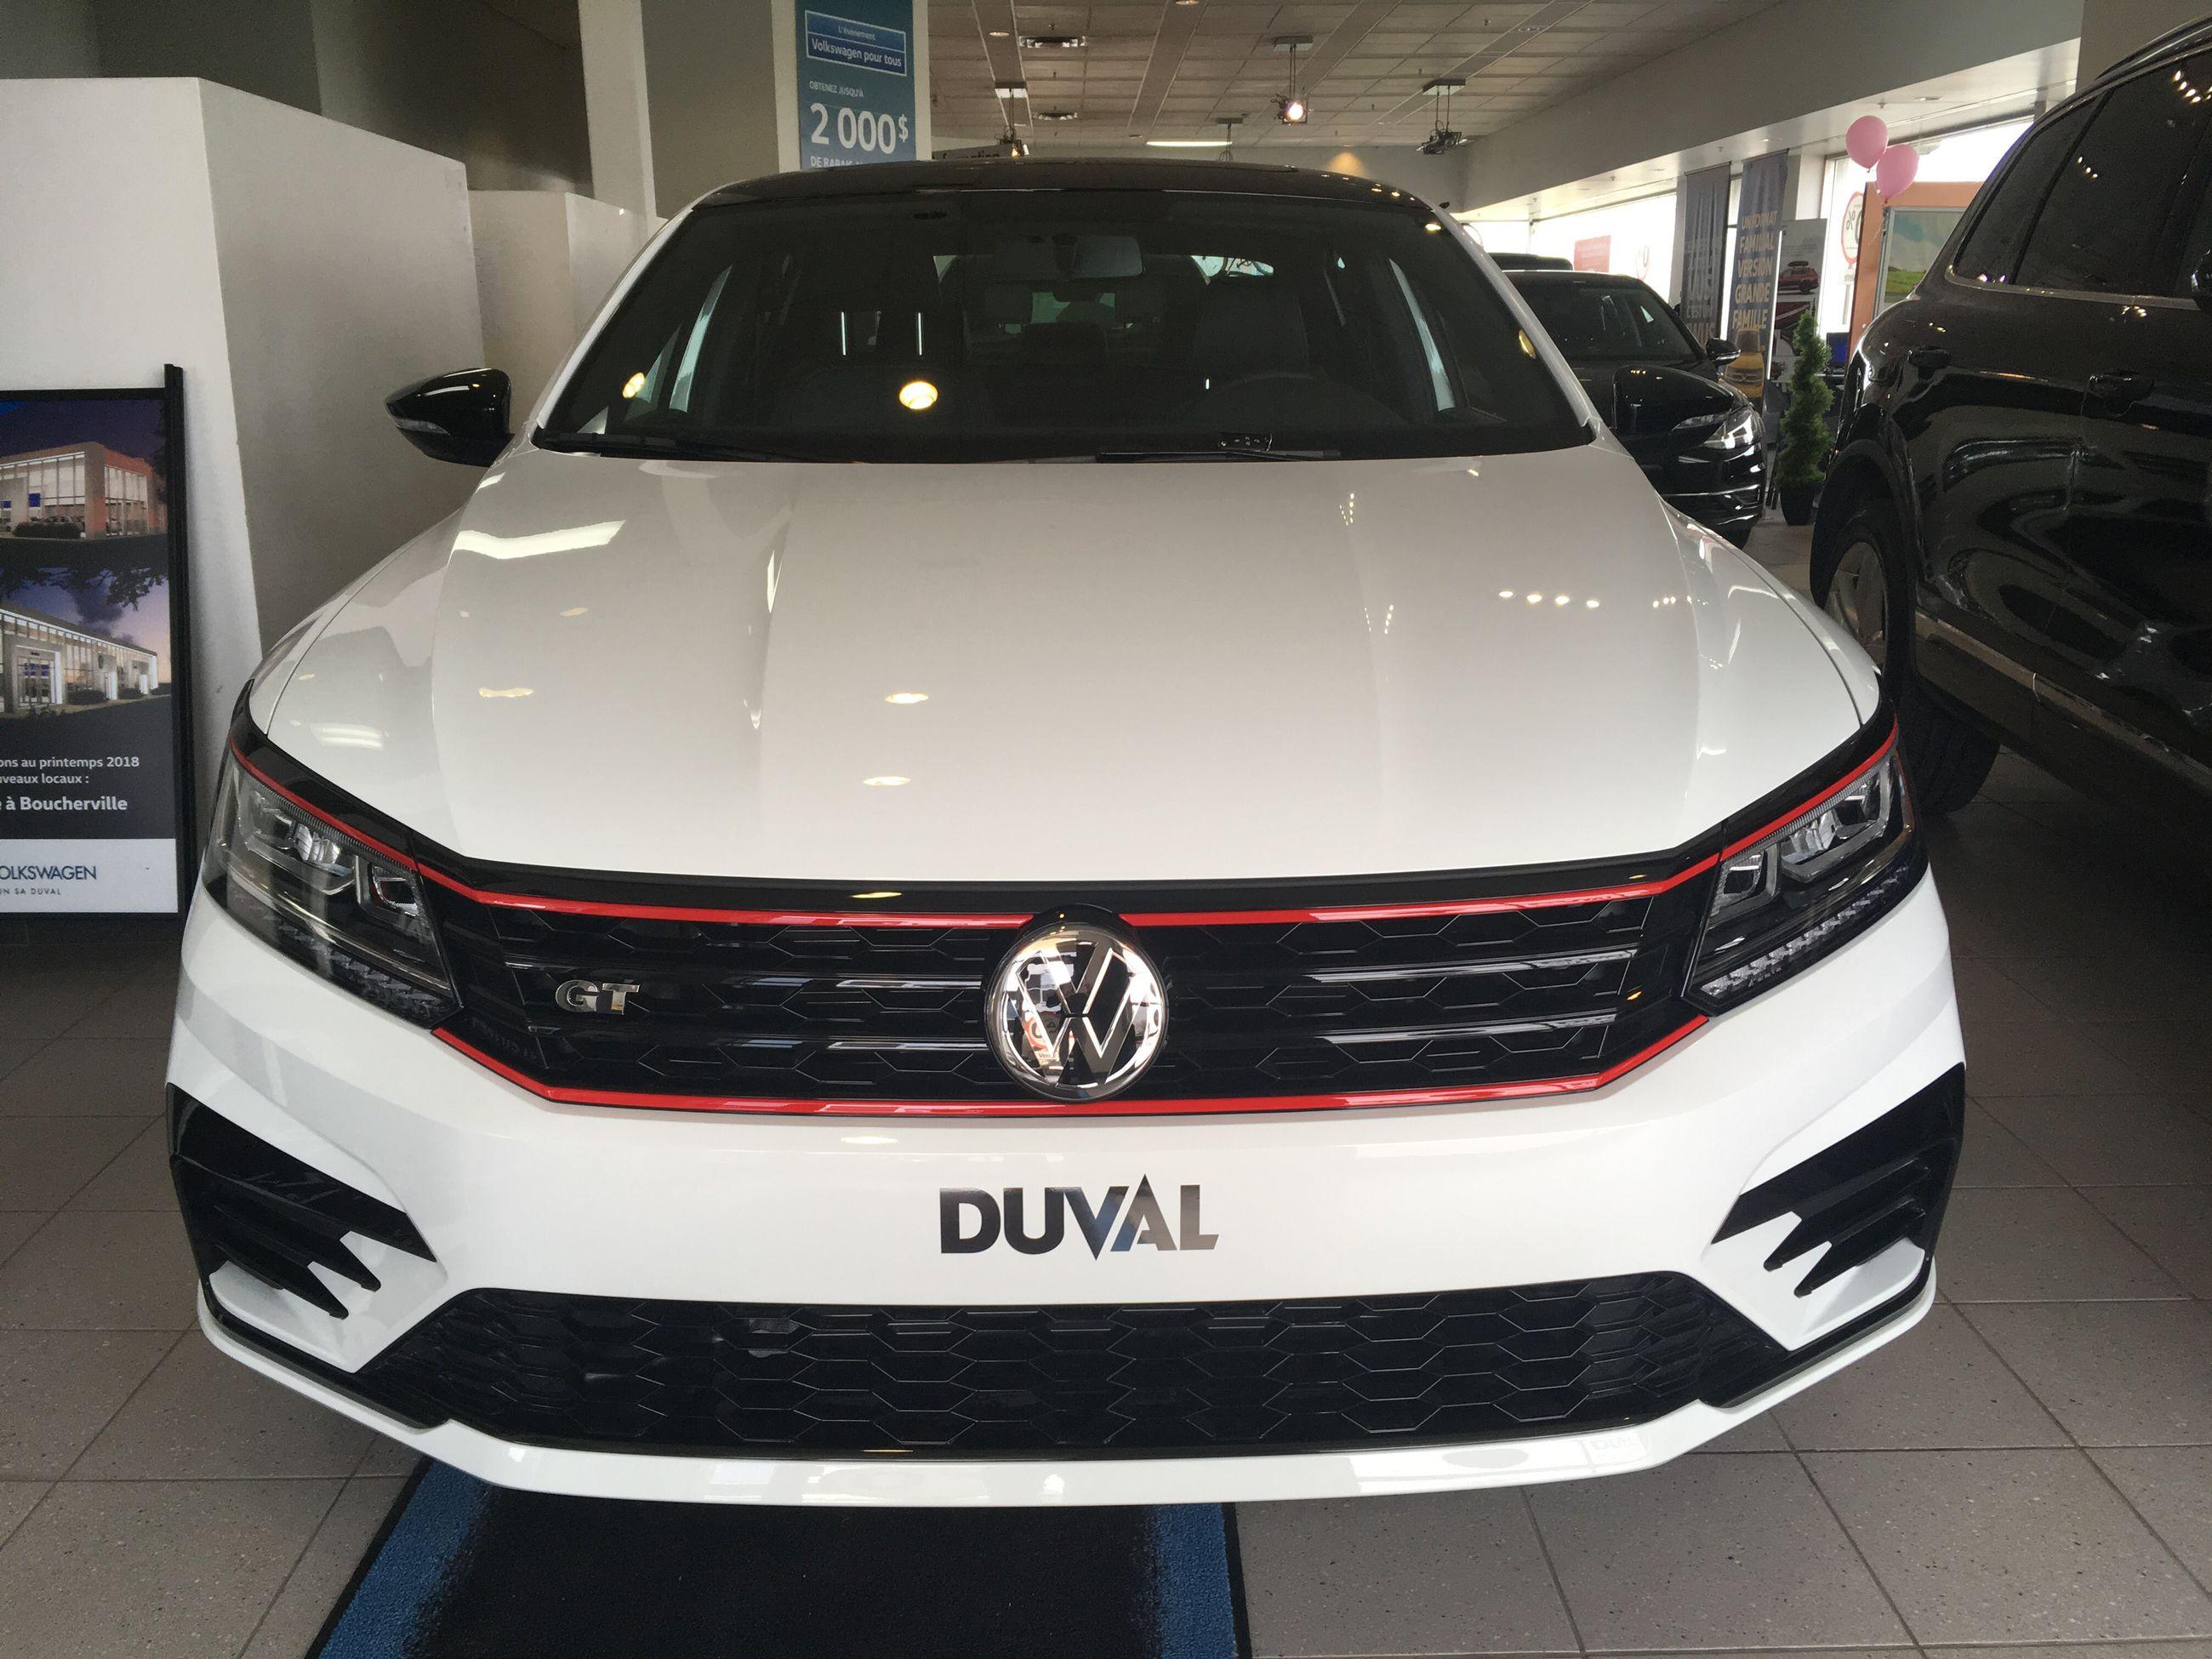 passat finance lease deals image new and offers exterior original volkswagen albuquerque vw specials main nm beetle